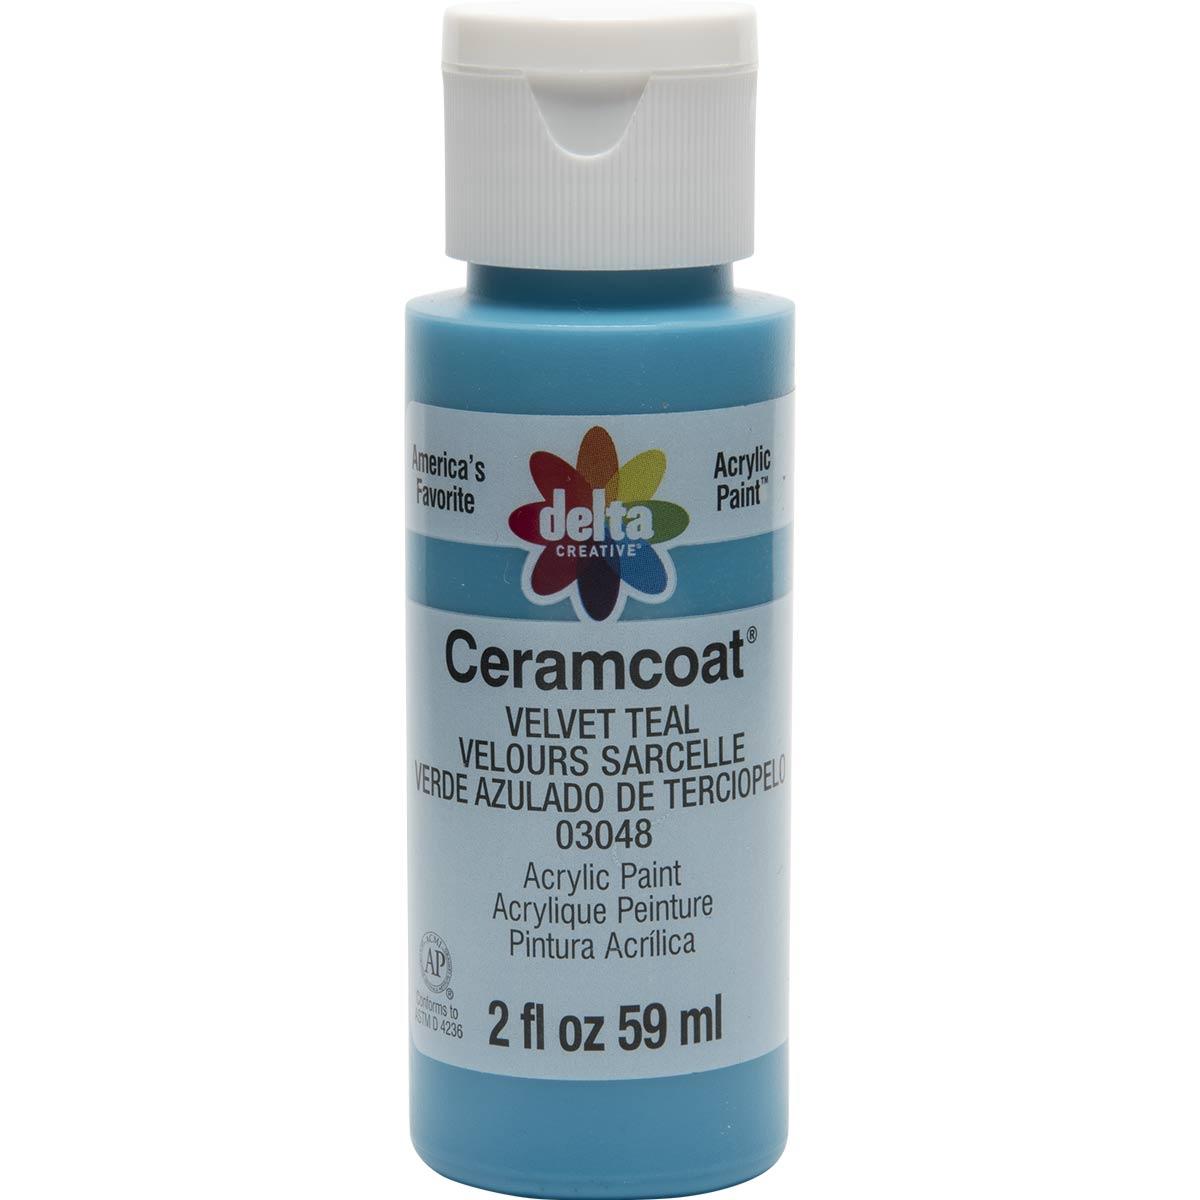 Delta Ceramcoat ® Acrylic Paint - Velvet Teal, 2 oz. - 03048